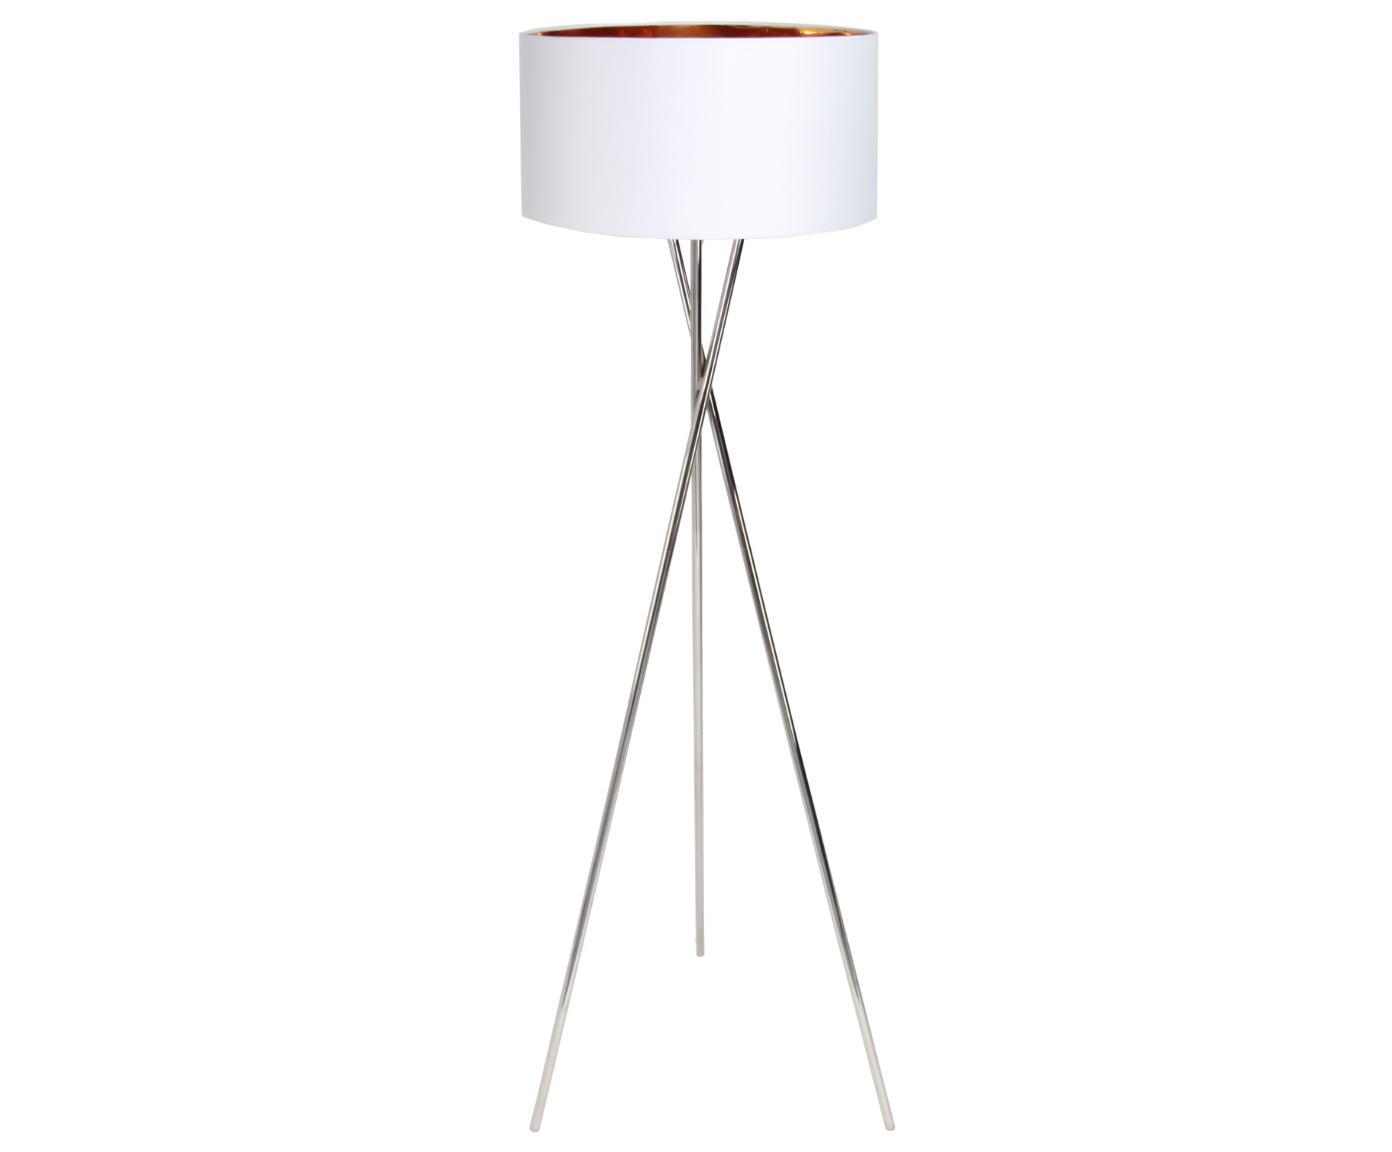 Jill & Jim Designs, Stehleuchte Giovanna, Lampe...